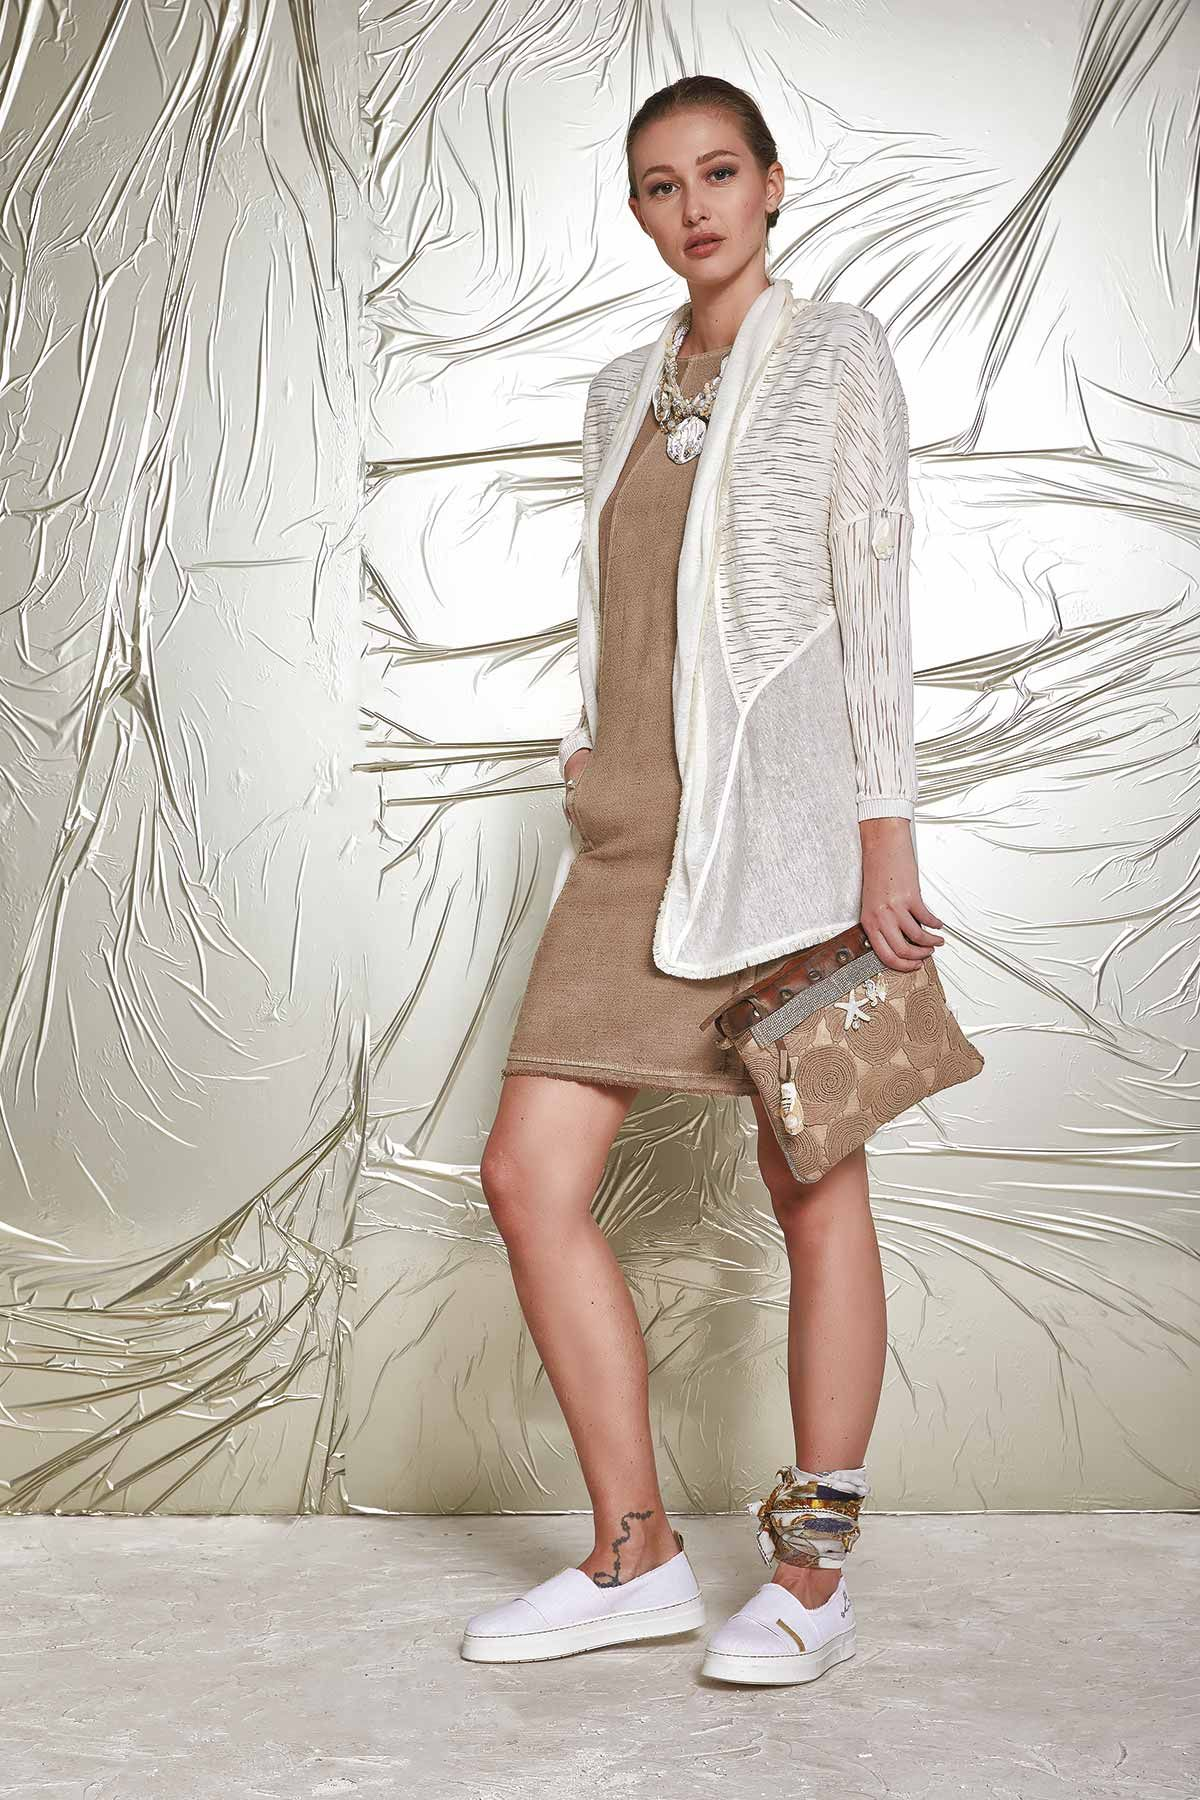 DANIELA DALLAVALLE - Lookbook #collection #danieladallavalle #elisacavaletti #PE17 #woman #shoes #foulard #bag #dress #necklace #jacket